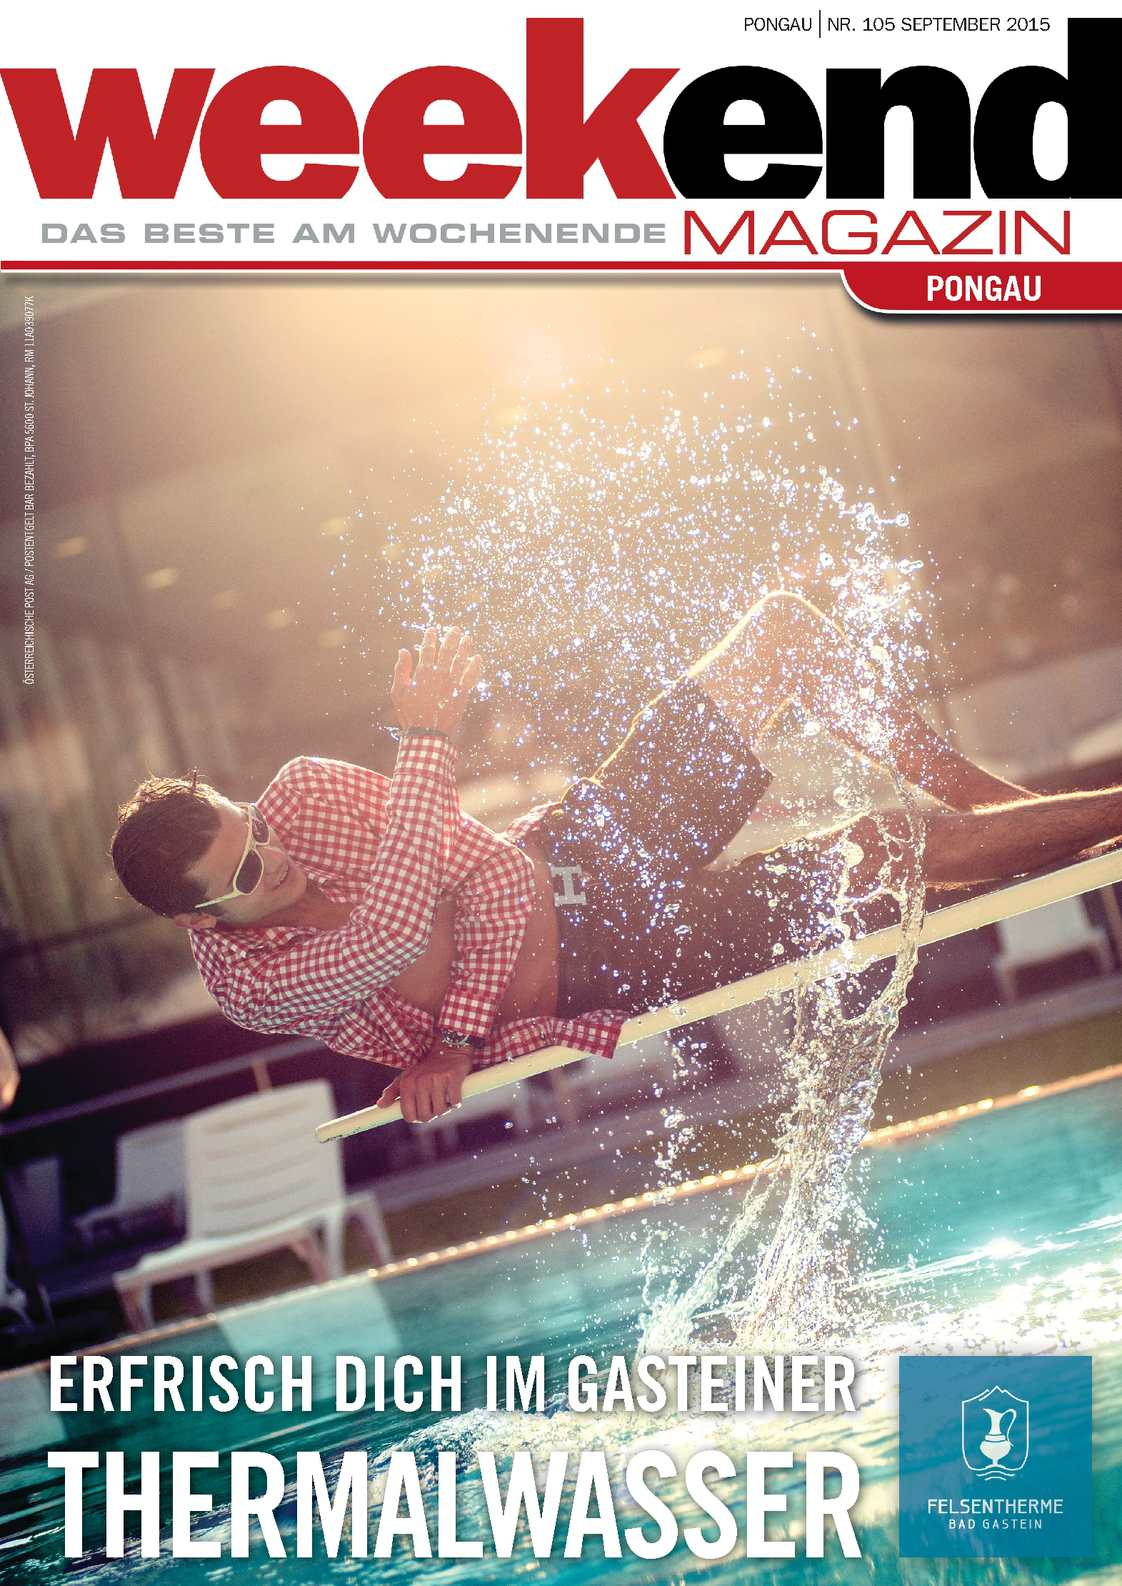 Calaméo - Weekend Magazin Pongau Ausgabe 105